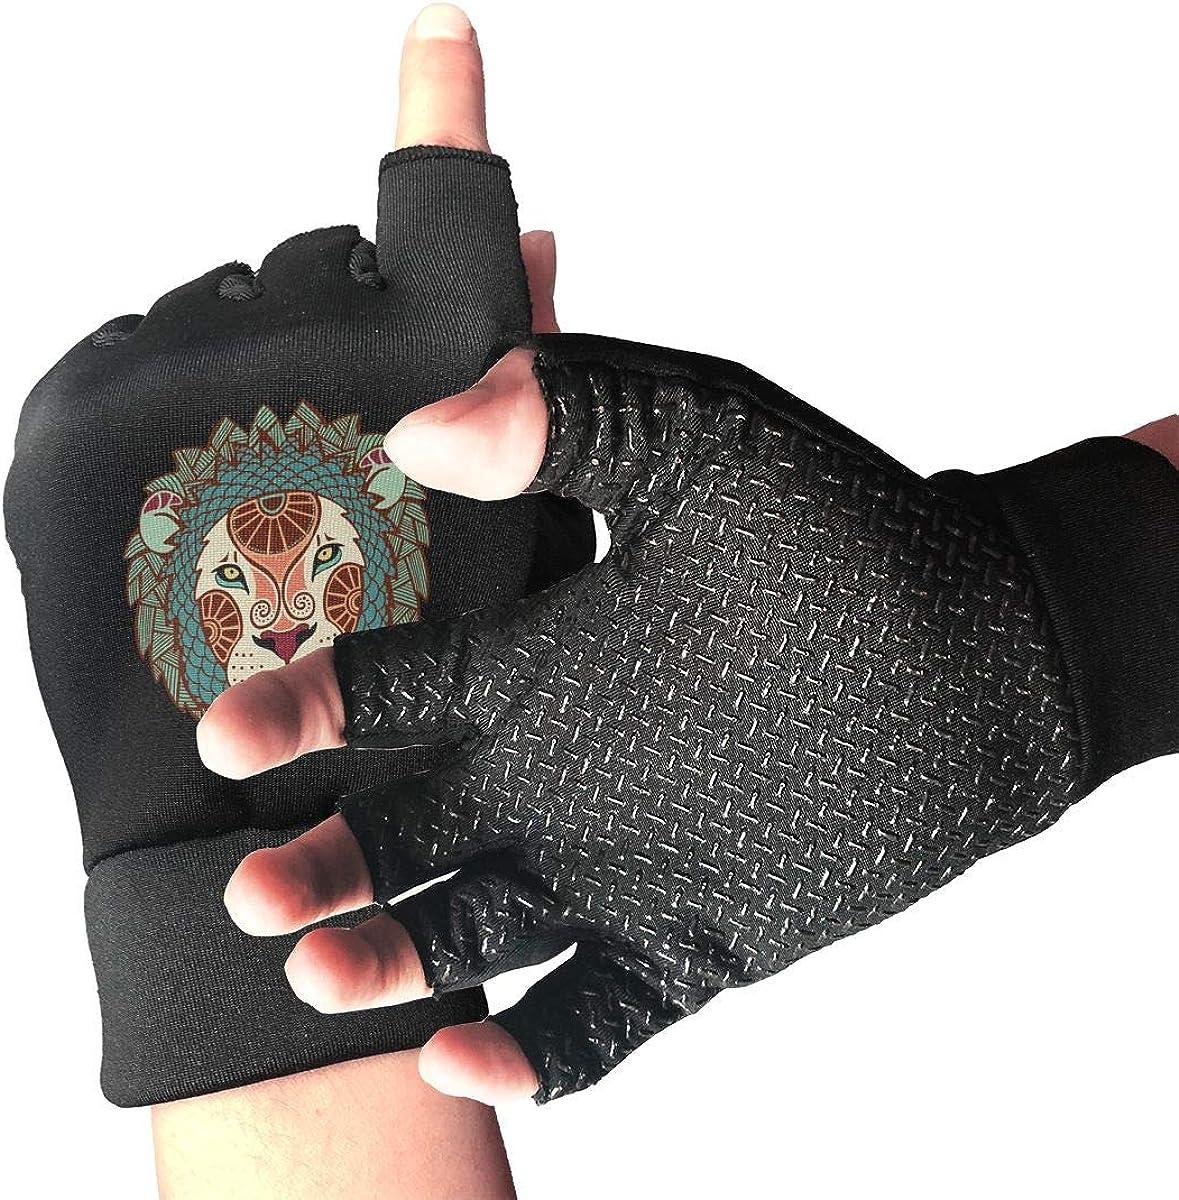 Gloves Leo Zodiac Fingerless Touchscreen Win Attention brand Inexpensive Short